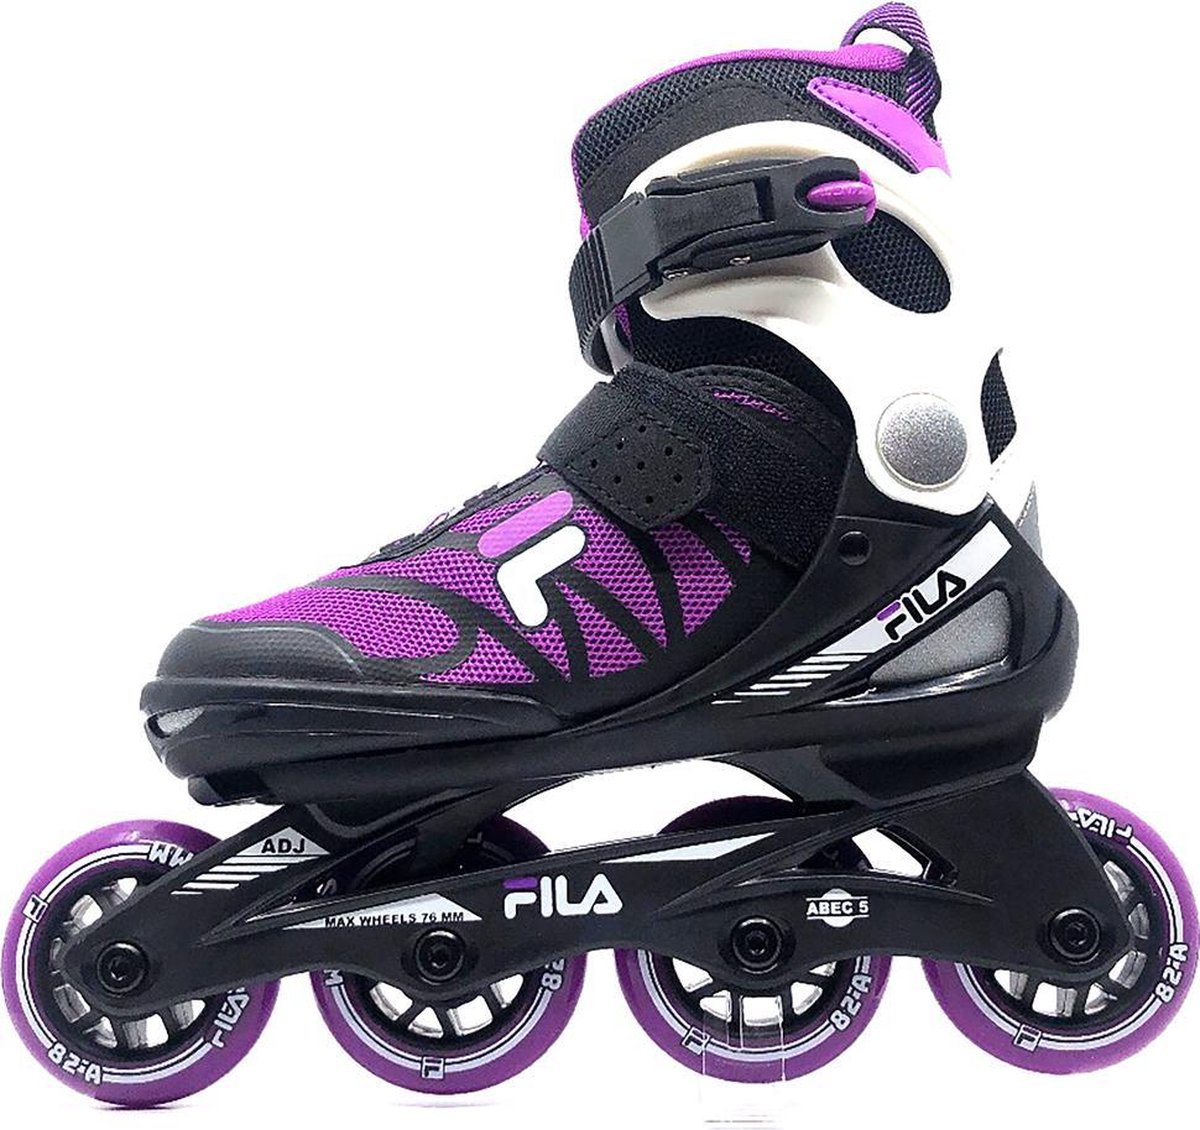 Fila - Verstelbare inline skates - J one - 21' - Maat 32-36 - Magenta - Zwart